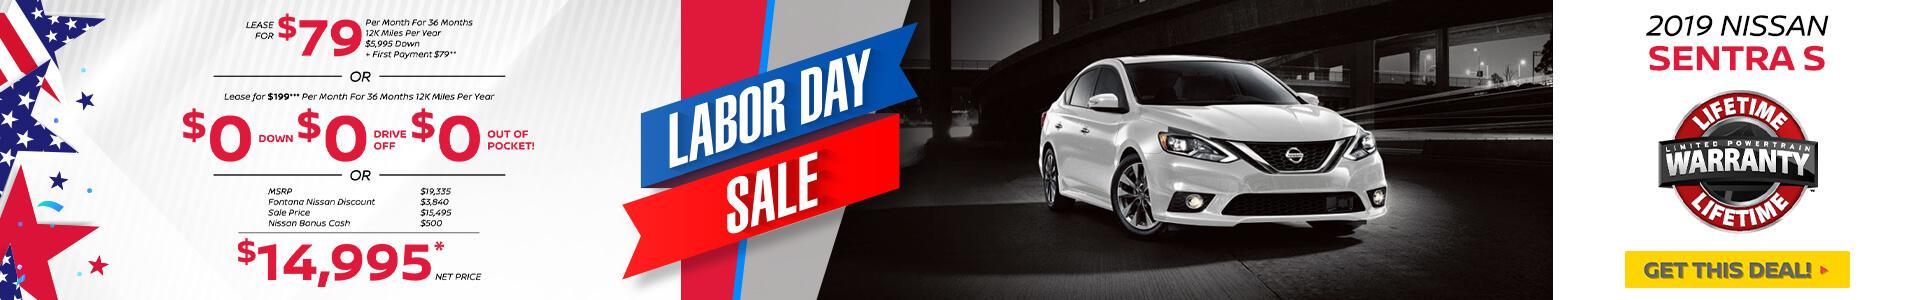 Nissan Sentra $79 Lease